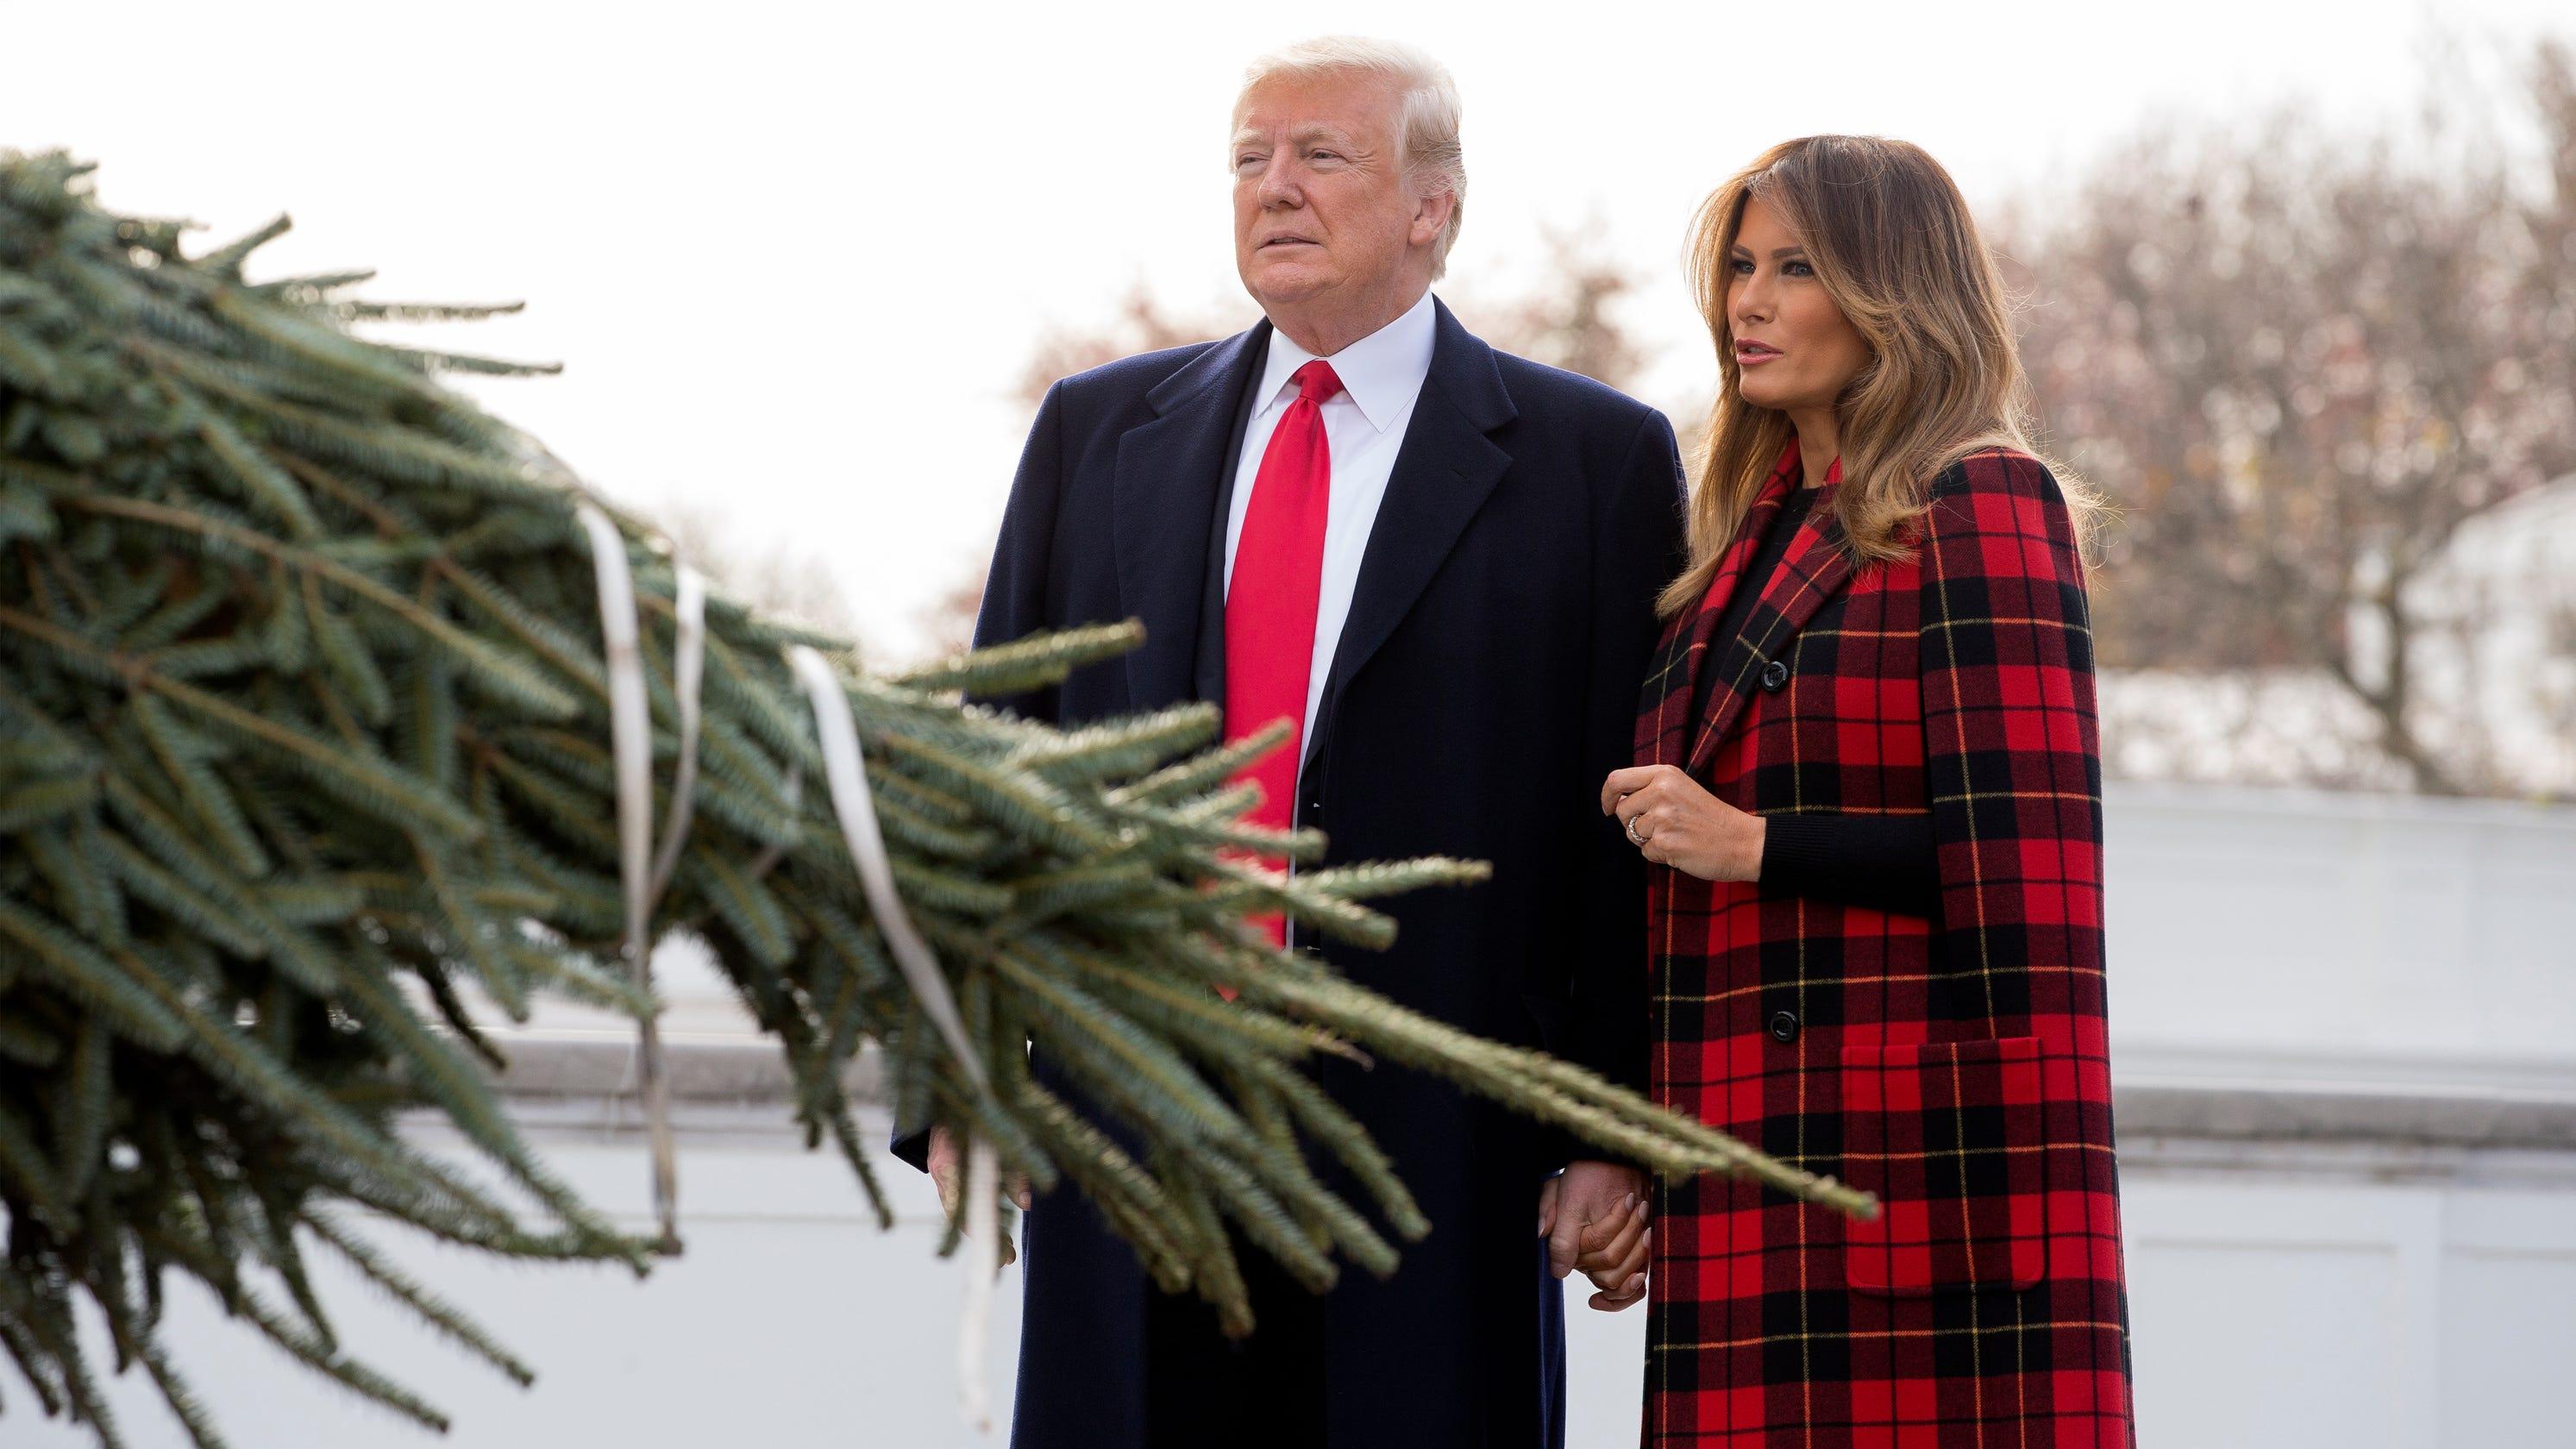 7bc193c3fdb5 President Trump first lady Melania Trump greet WH Christmas tree